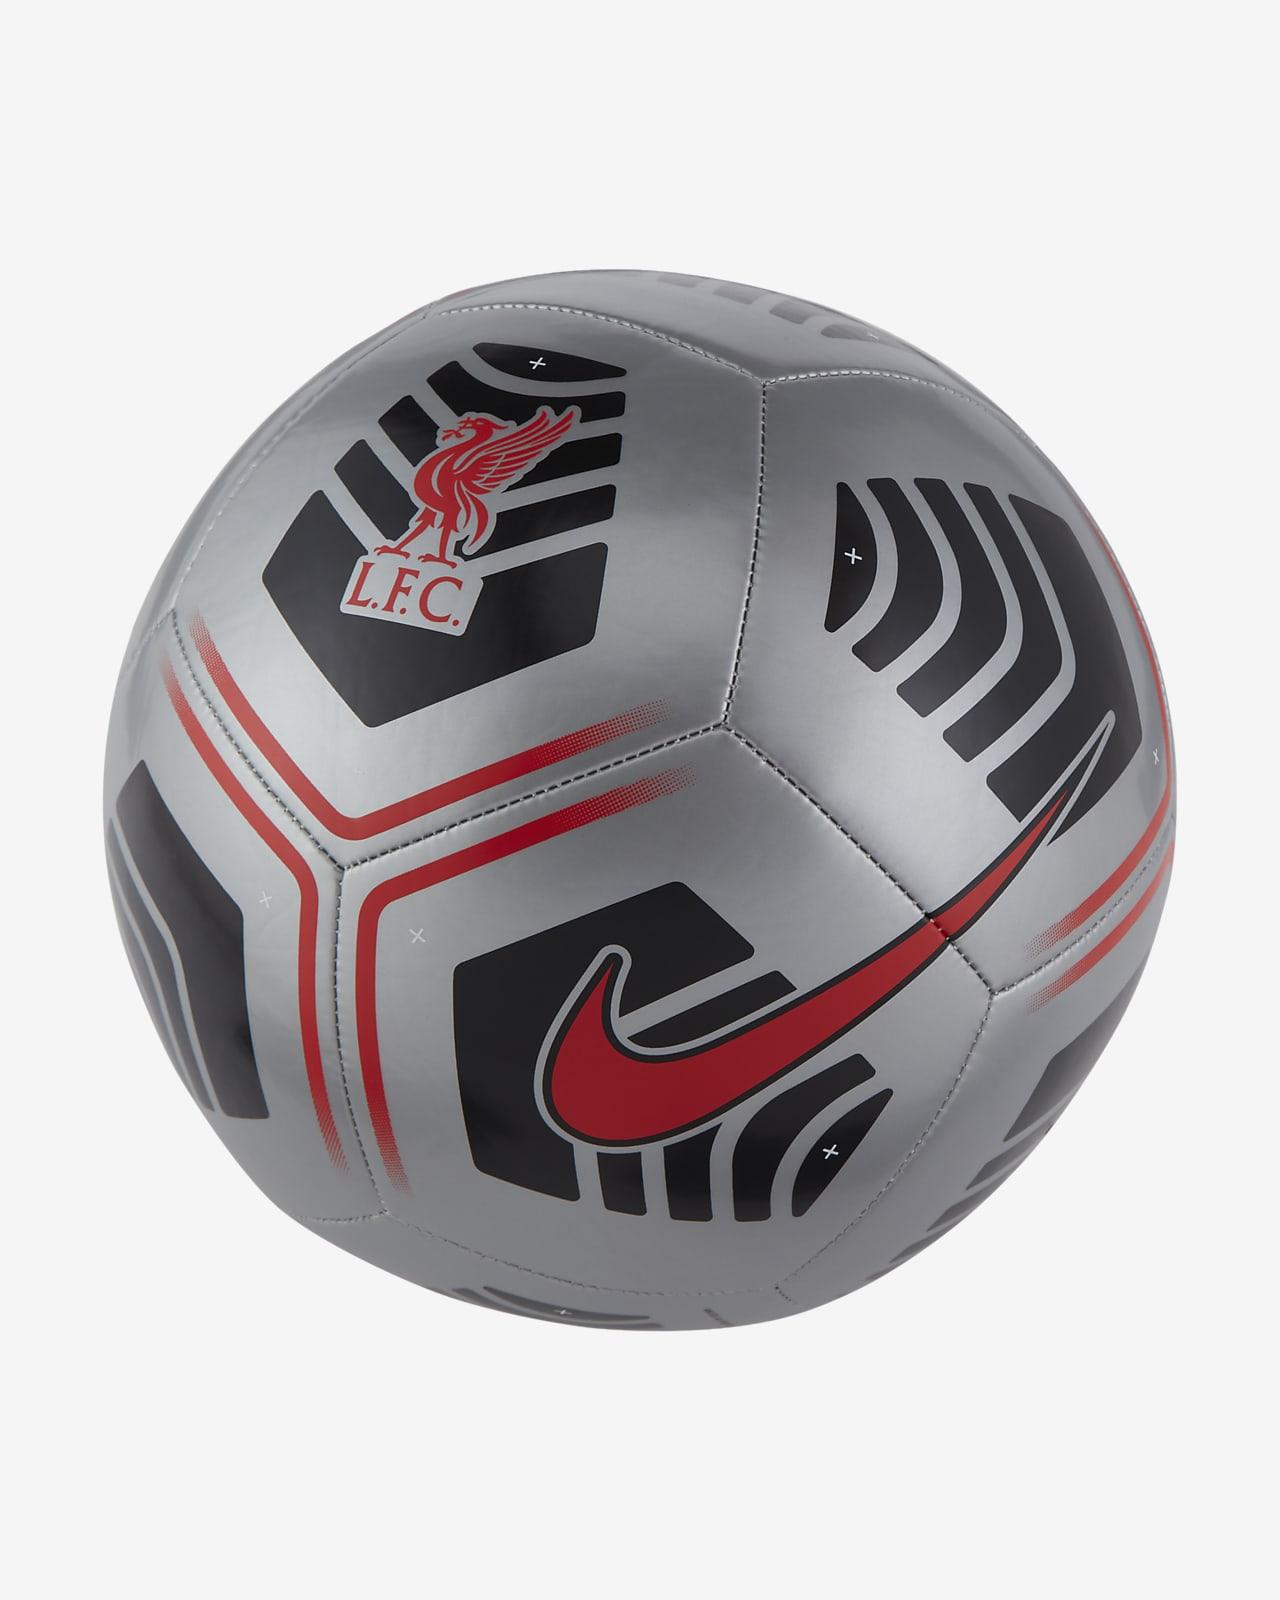 Bola de futebol Liverpool FC Pitch